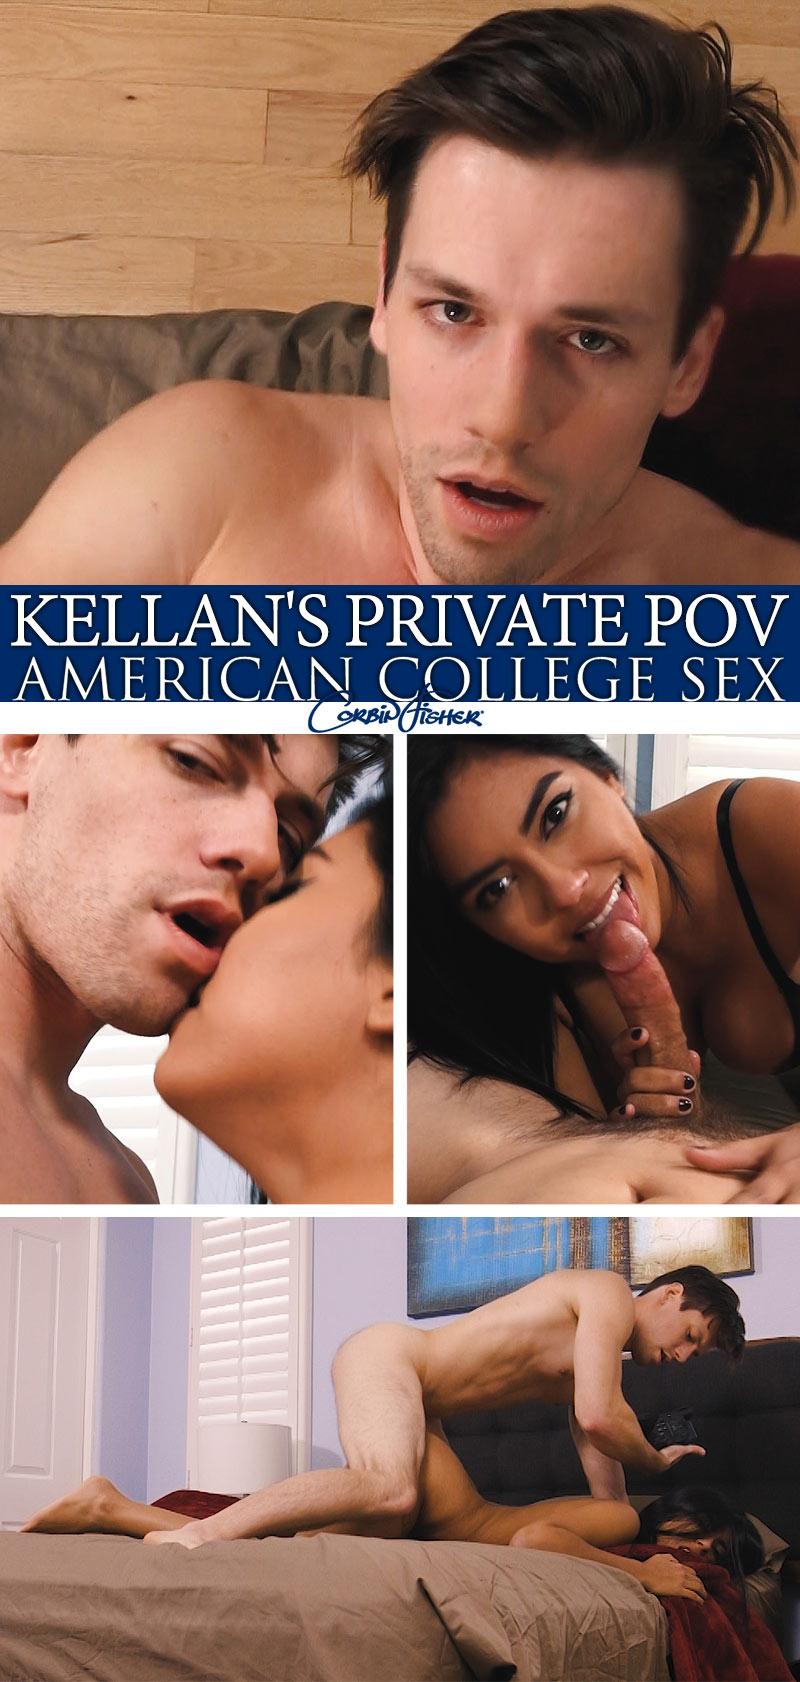 Kellan's Private POV at AmateurCollegeSex